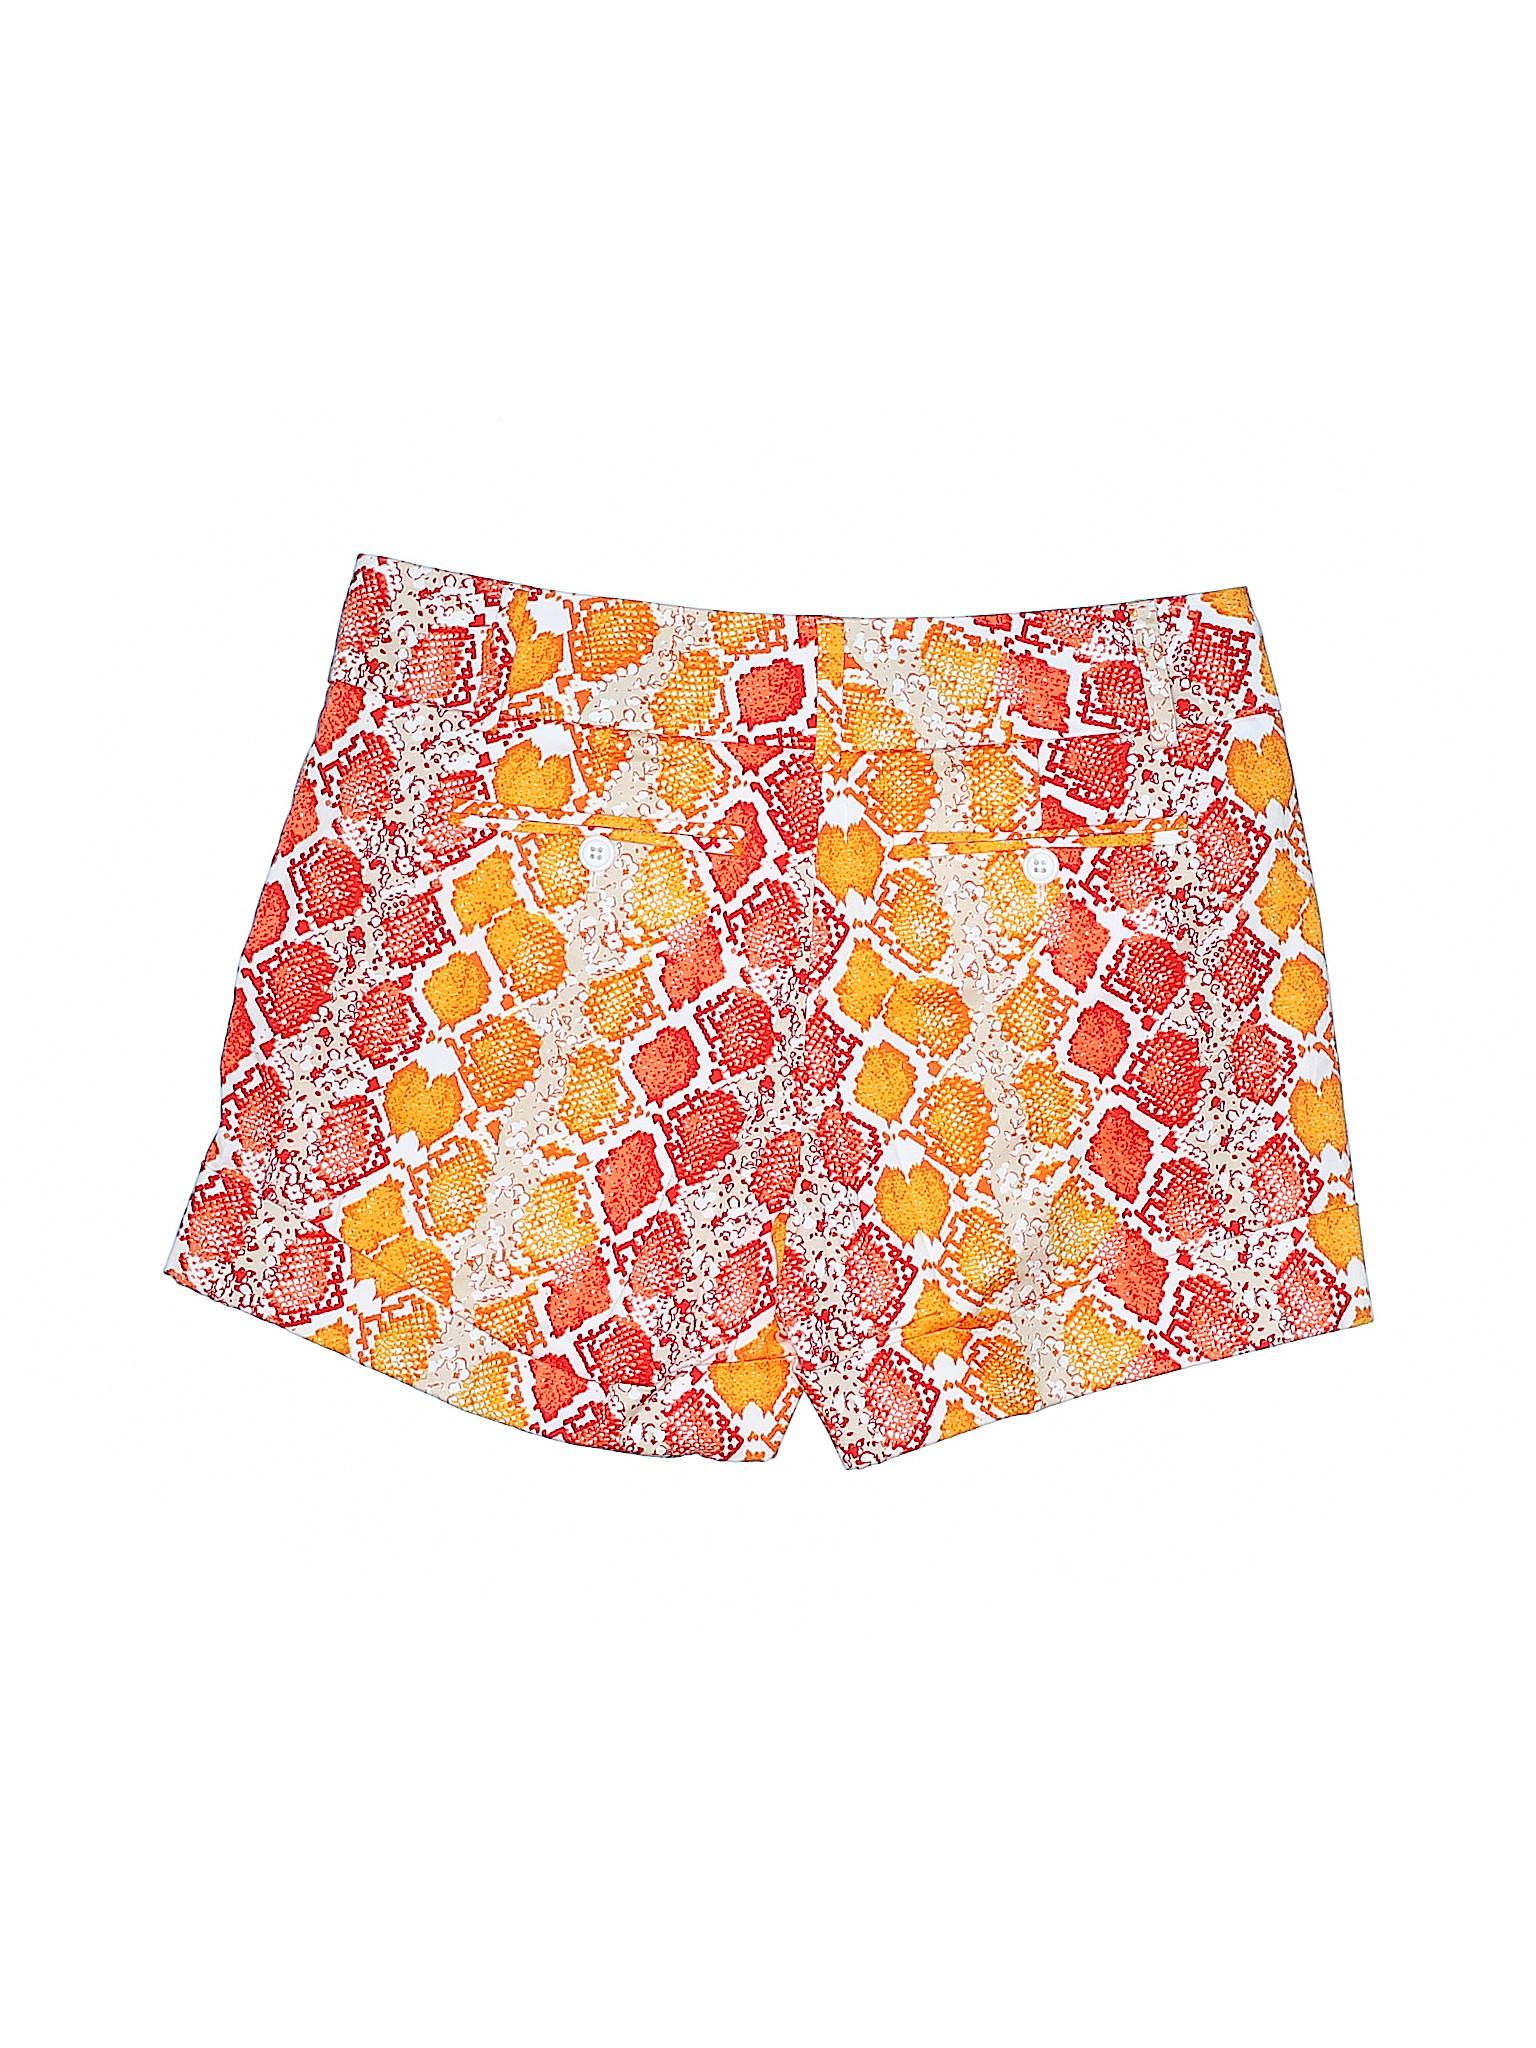 amp; York Avenue Shorts New Studio 7th Company Boutique Khaki Design YwX4qP